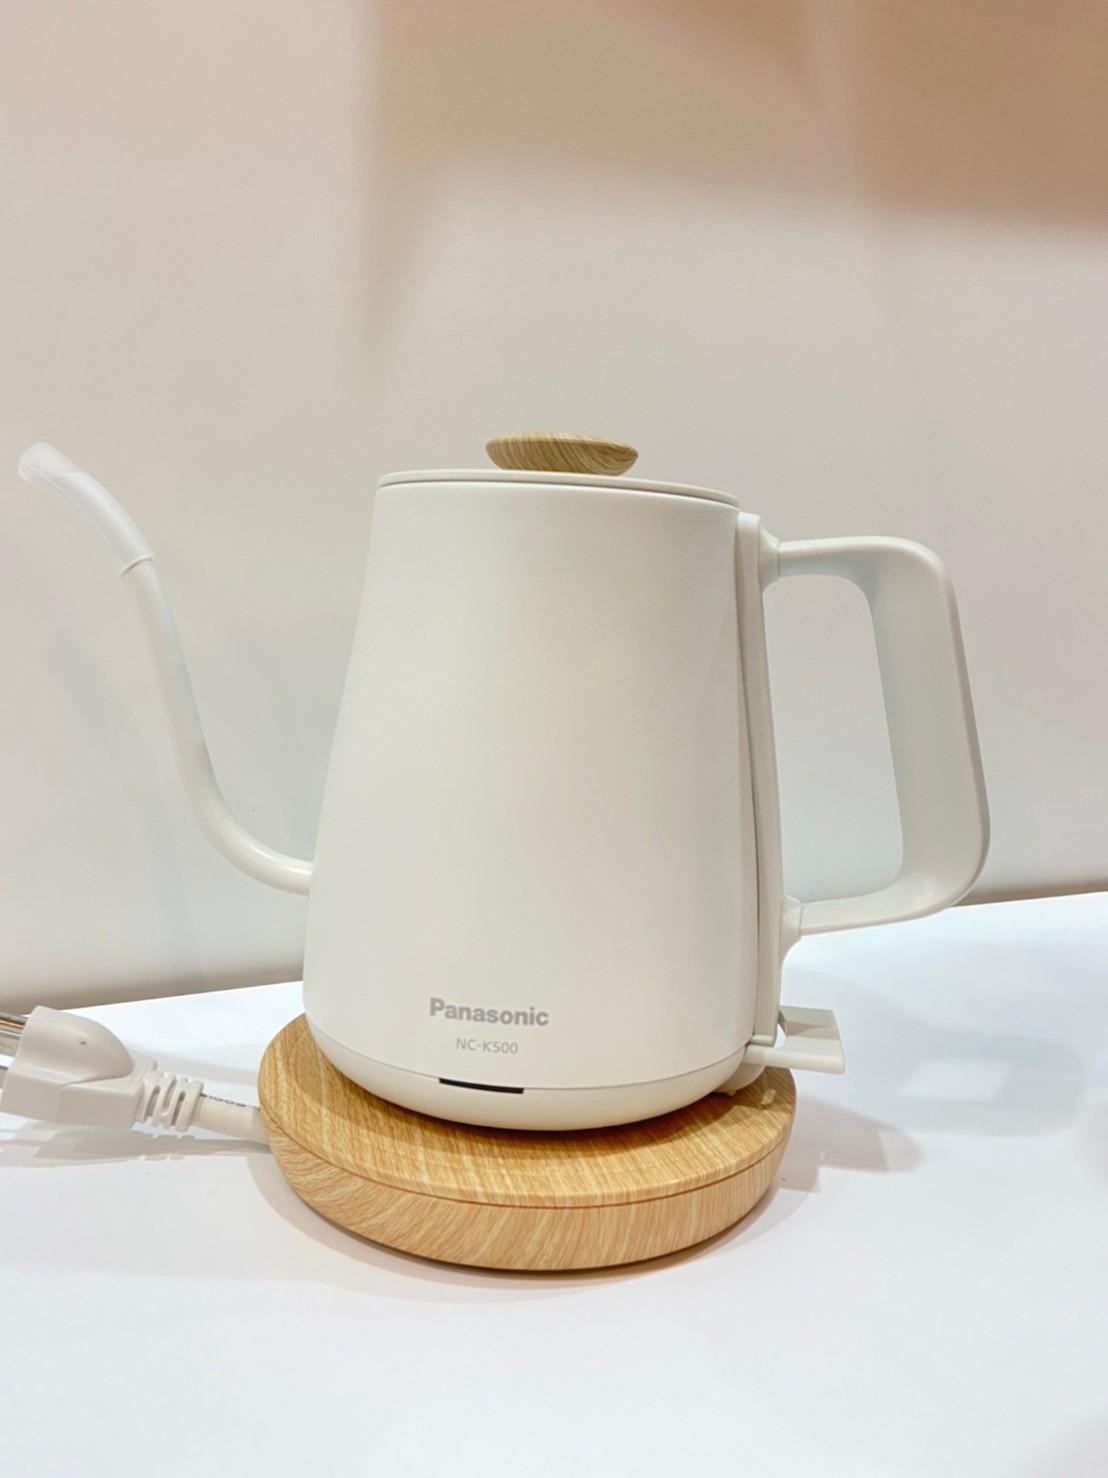 Panasonic 國際牌【文青手沖】NC-K500 咖啡手沖壺 細口壺